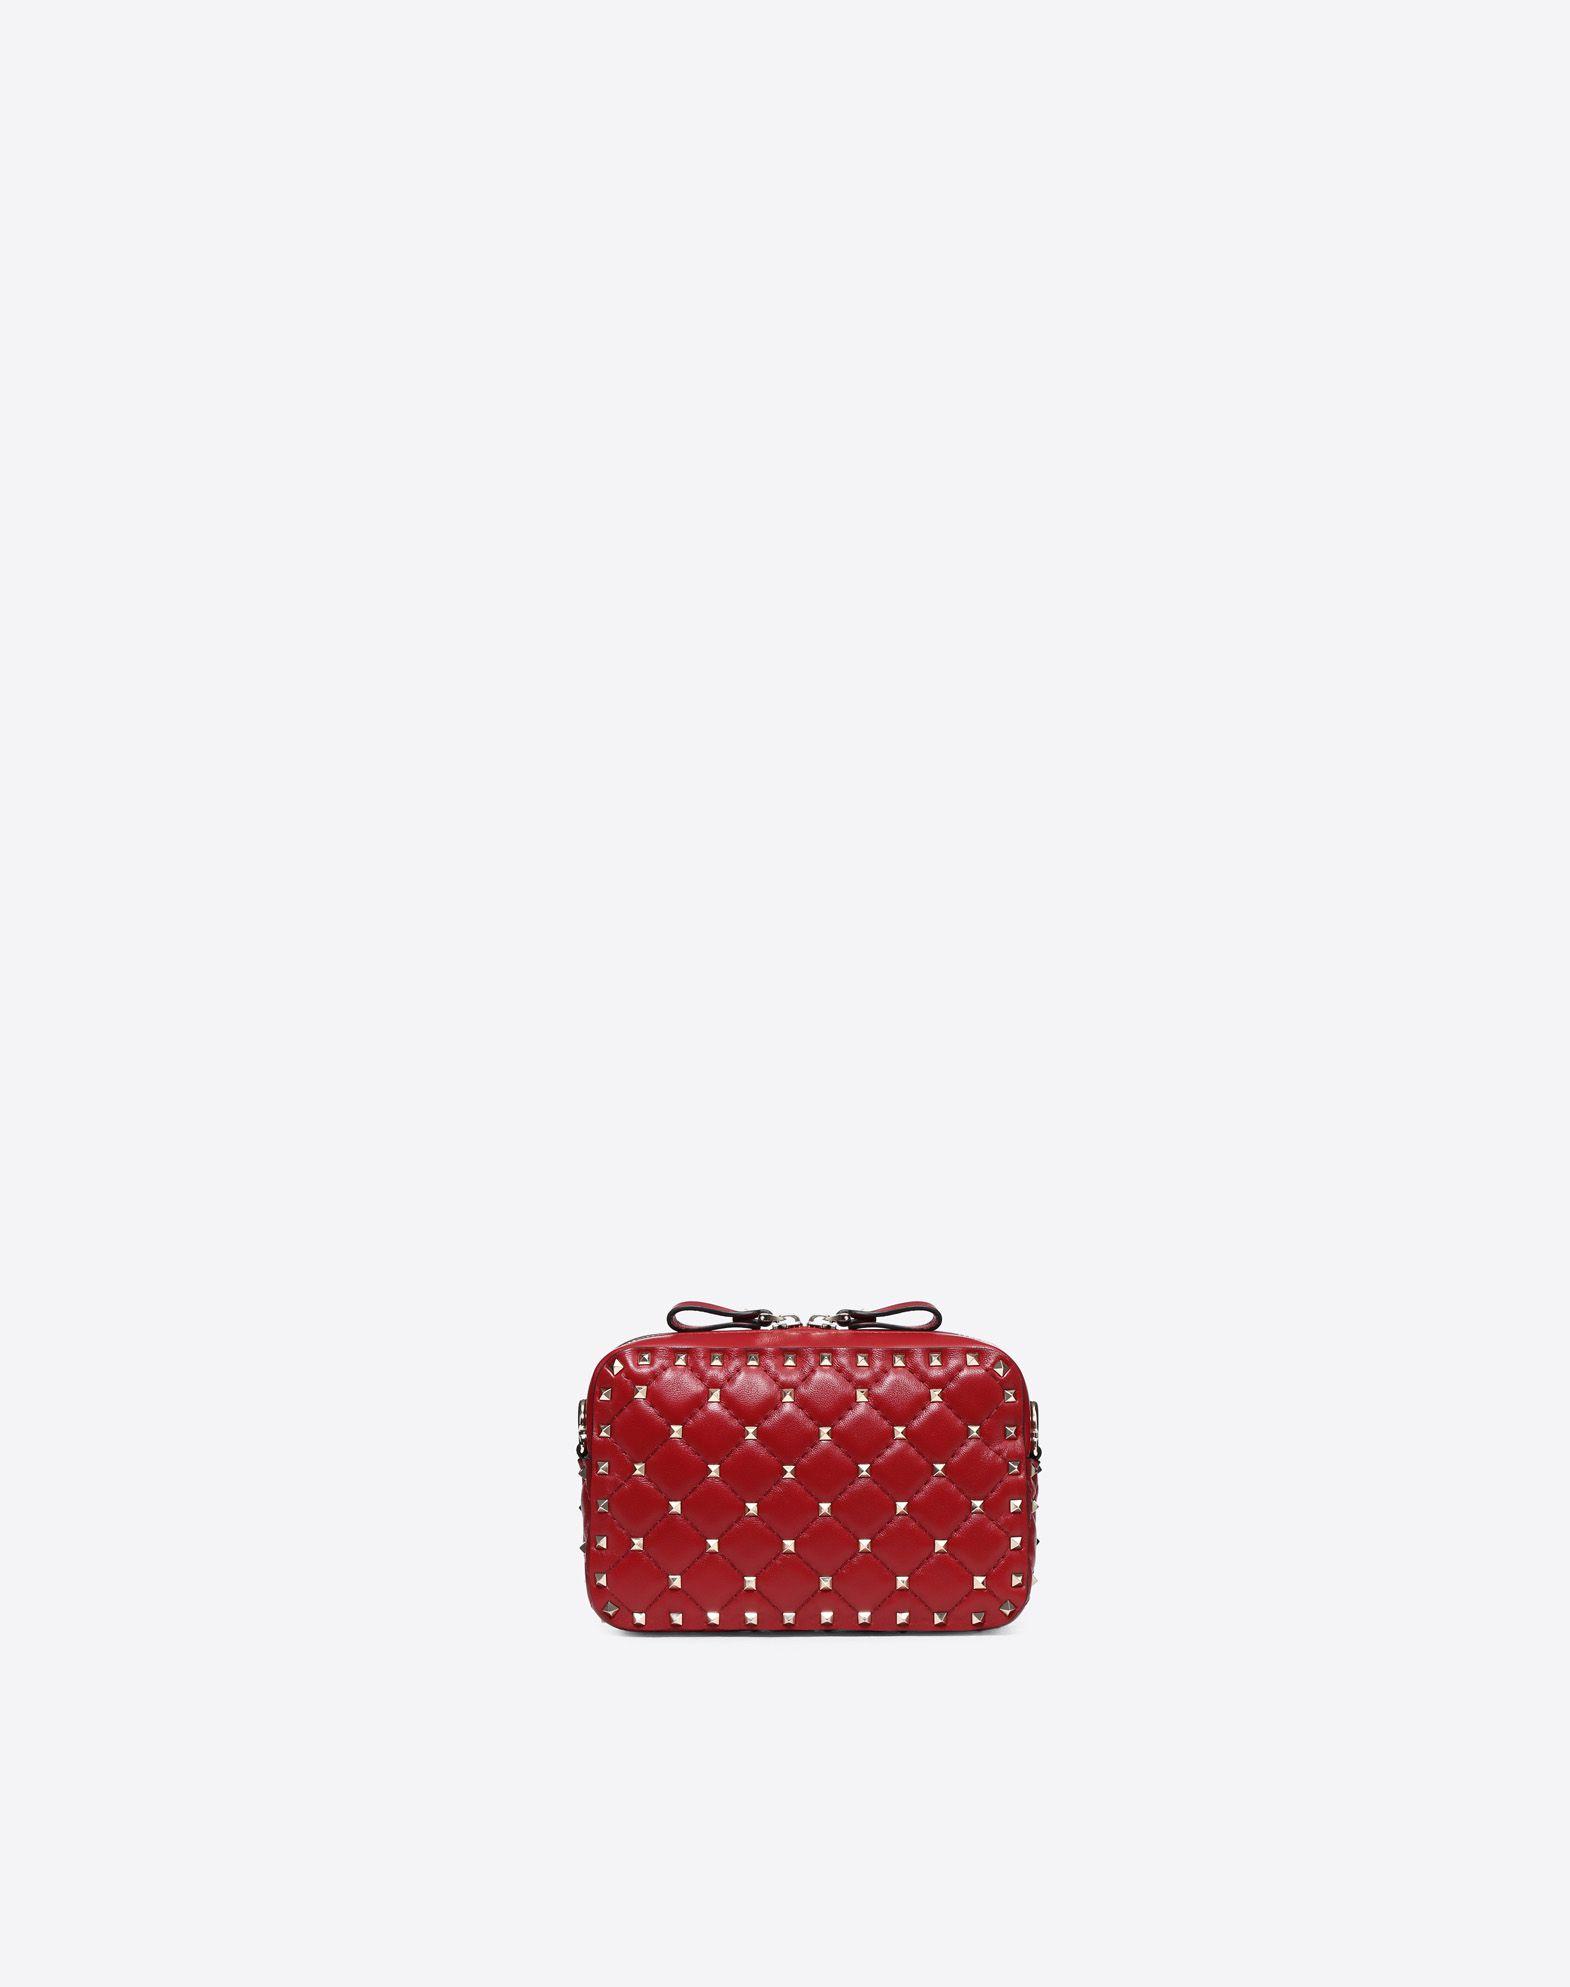 VALENTINO GARAVANI Rockstud Spike Cross Body Bag CROSS BODY BAG D d